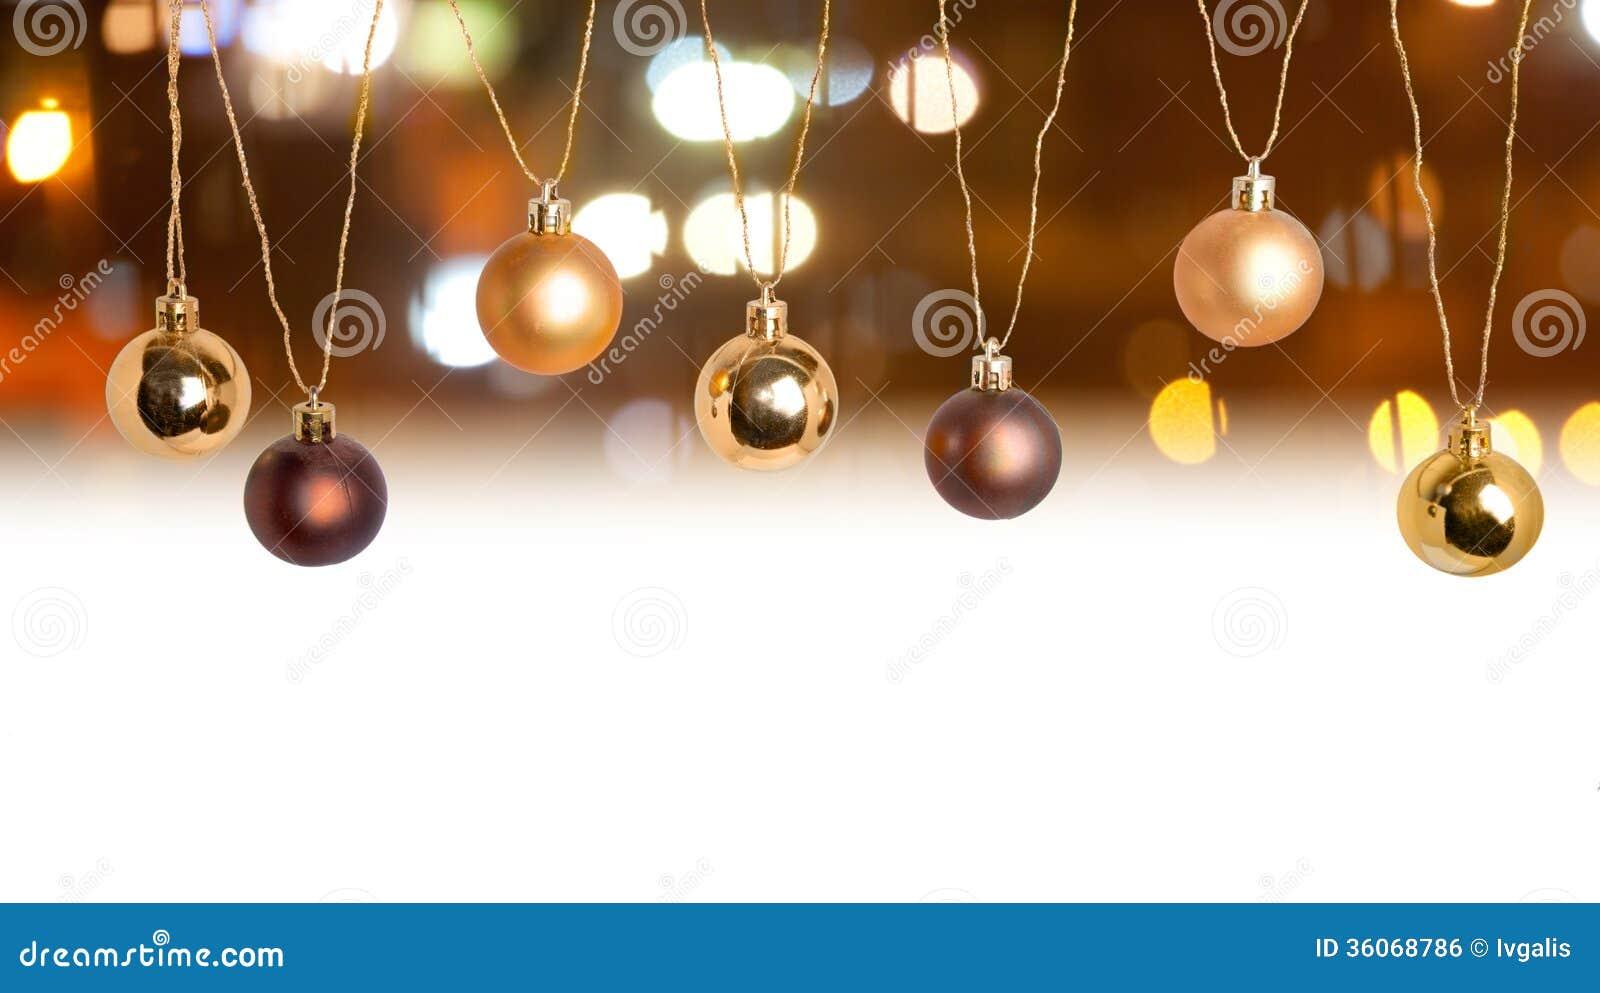 Christmas Card Border With Bokeh Backdrop Royalty Free Stock Image ...